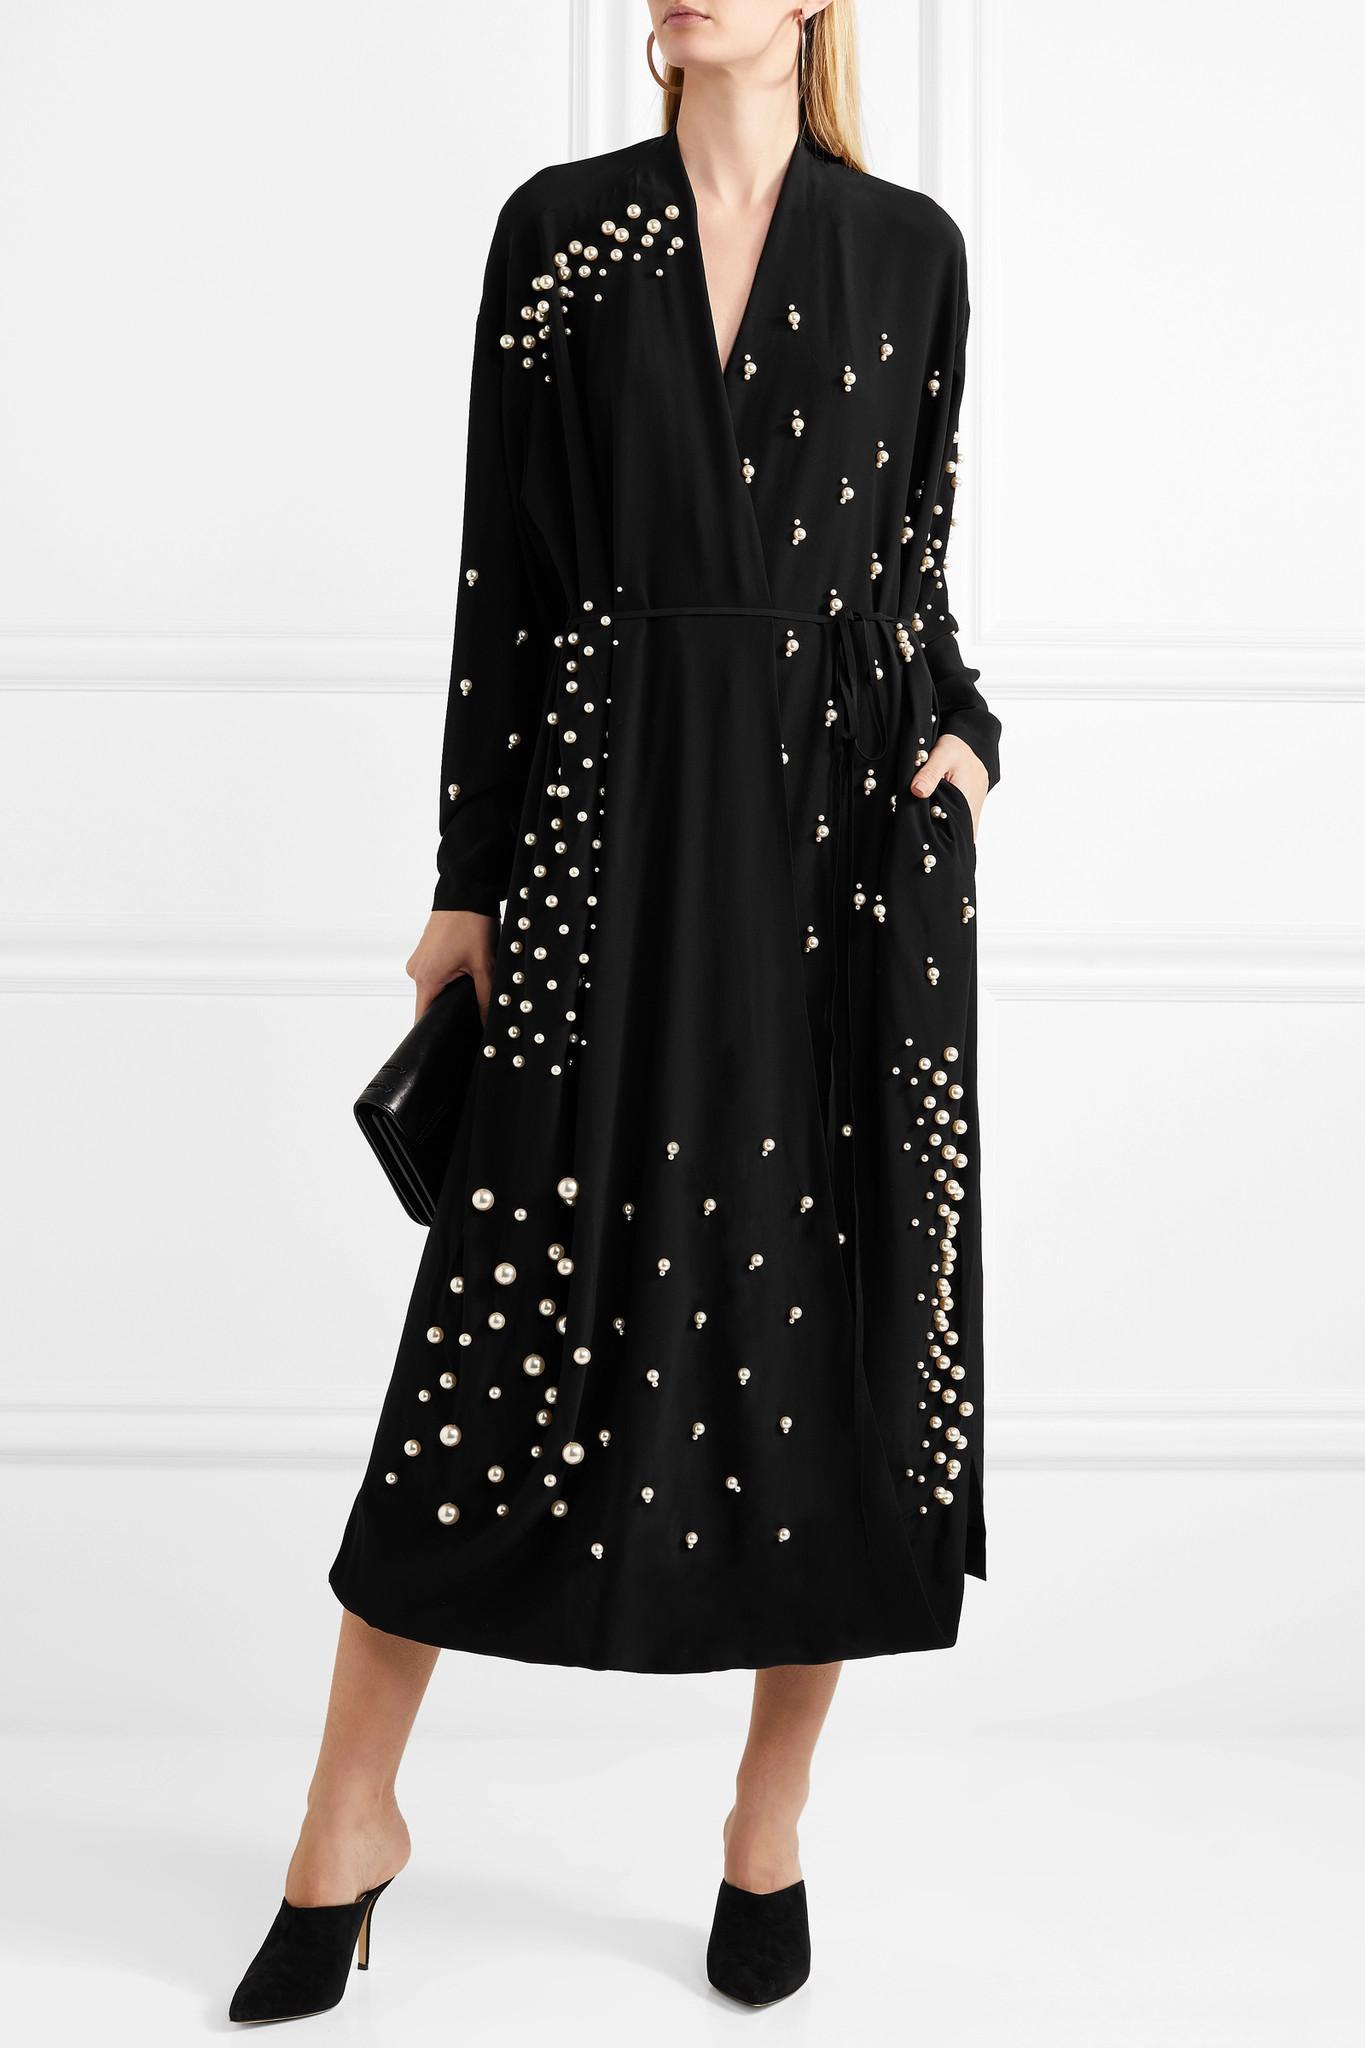 Oversized Faux Pearl-embellished Silk Crepe De Chine Wrap Dress - Black Stella McCartney Original Online Best Clearance Sast Clearance Websites 2viAb6